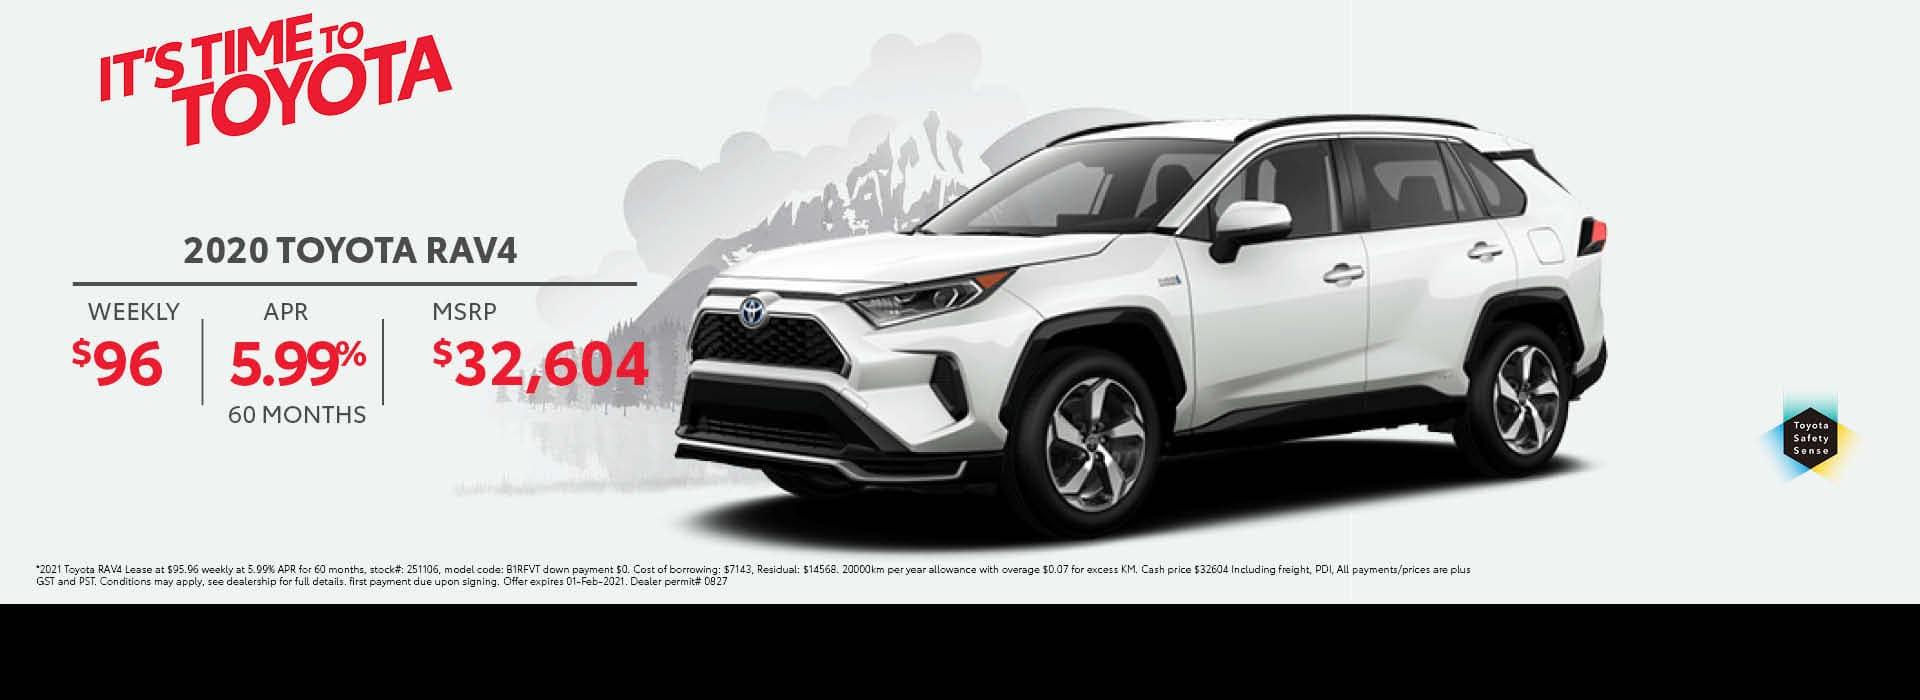 2020_Toyota_Rav4_Desktop_Jan2021